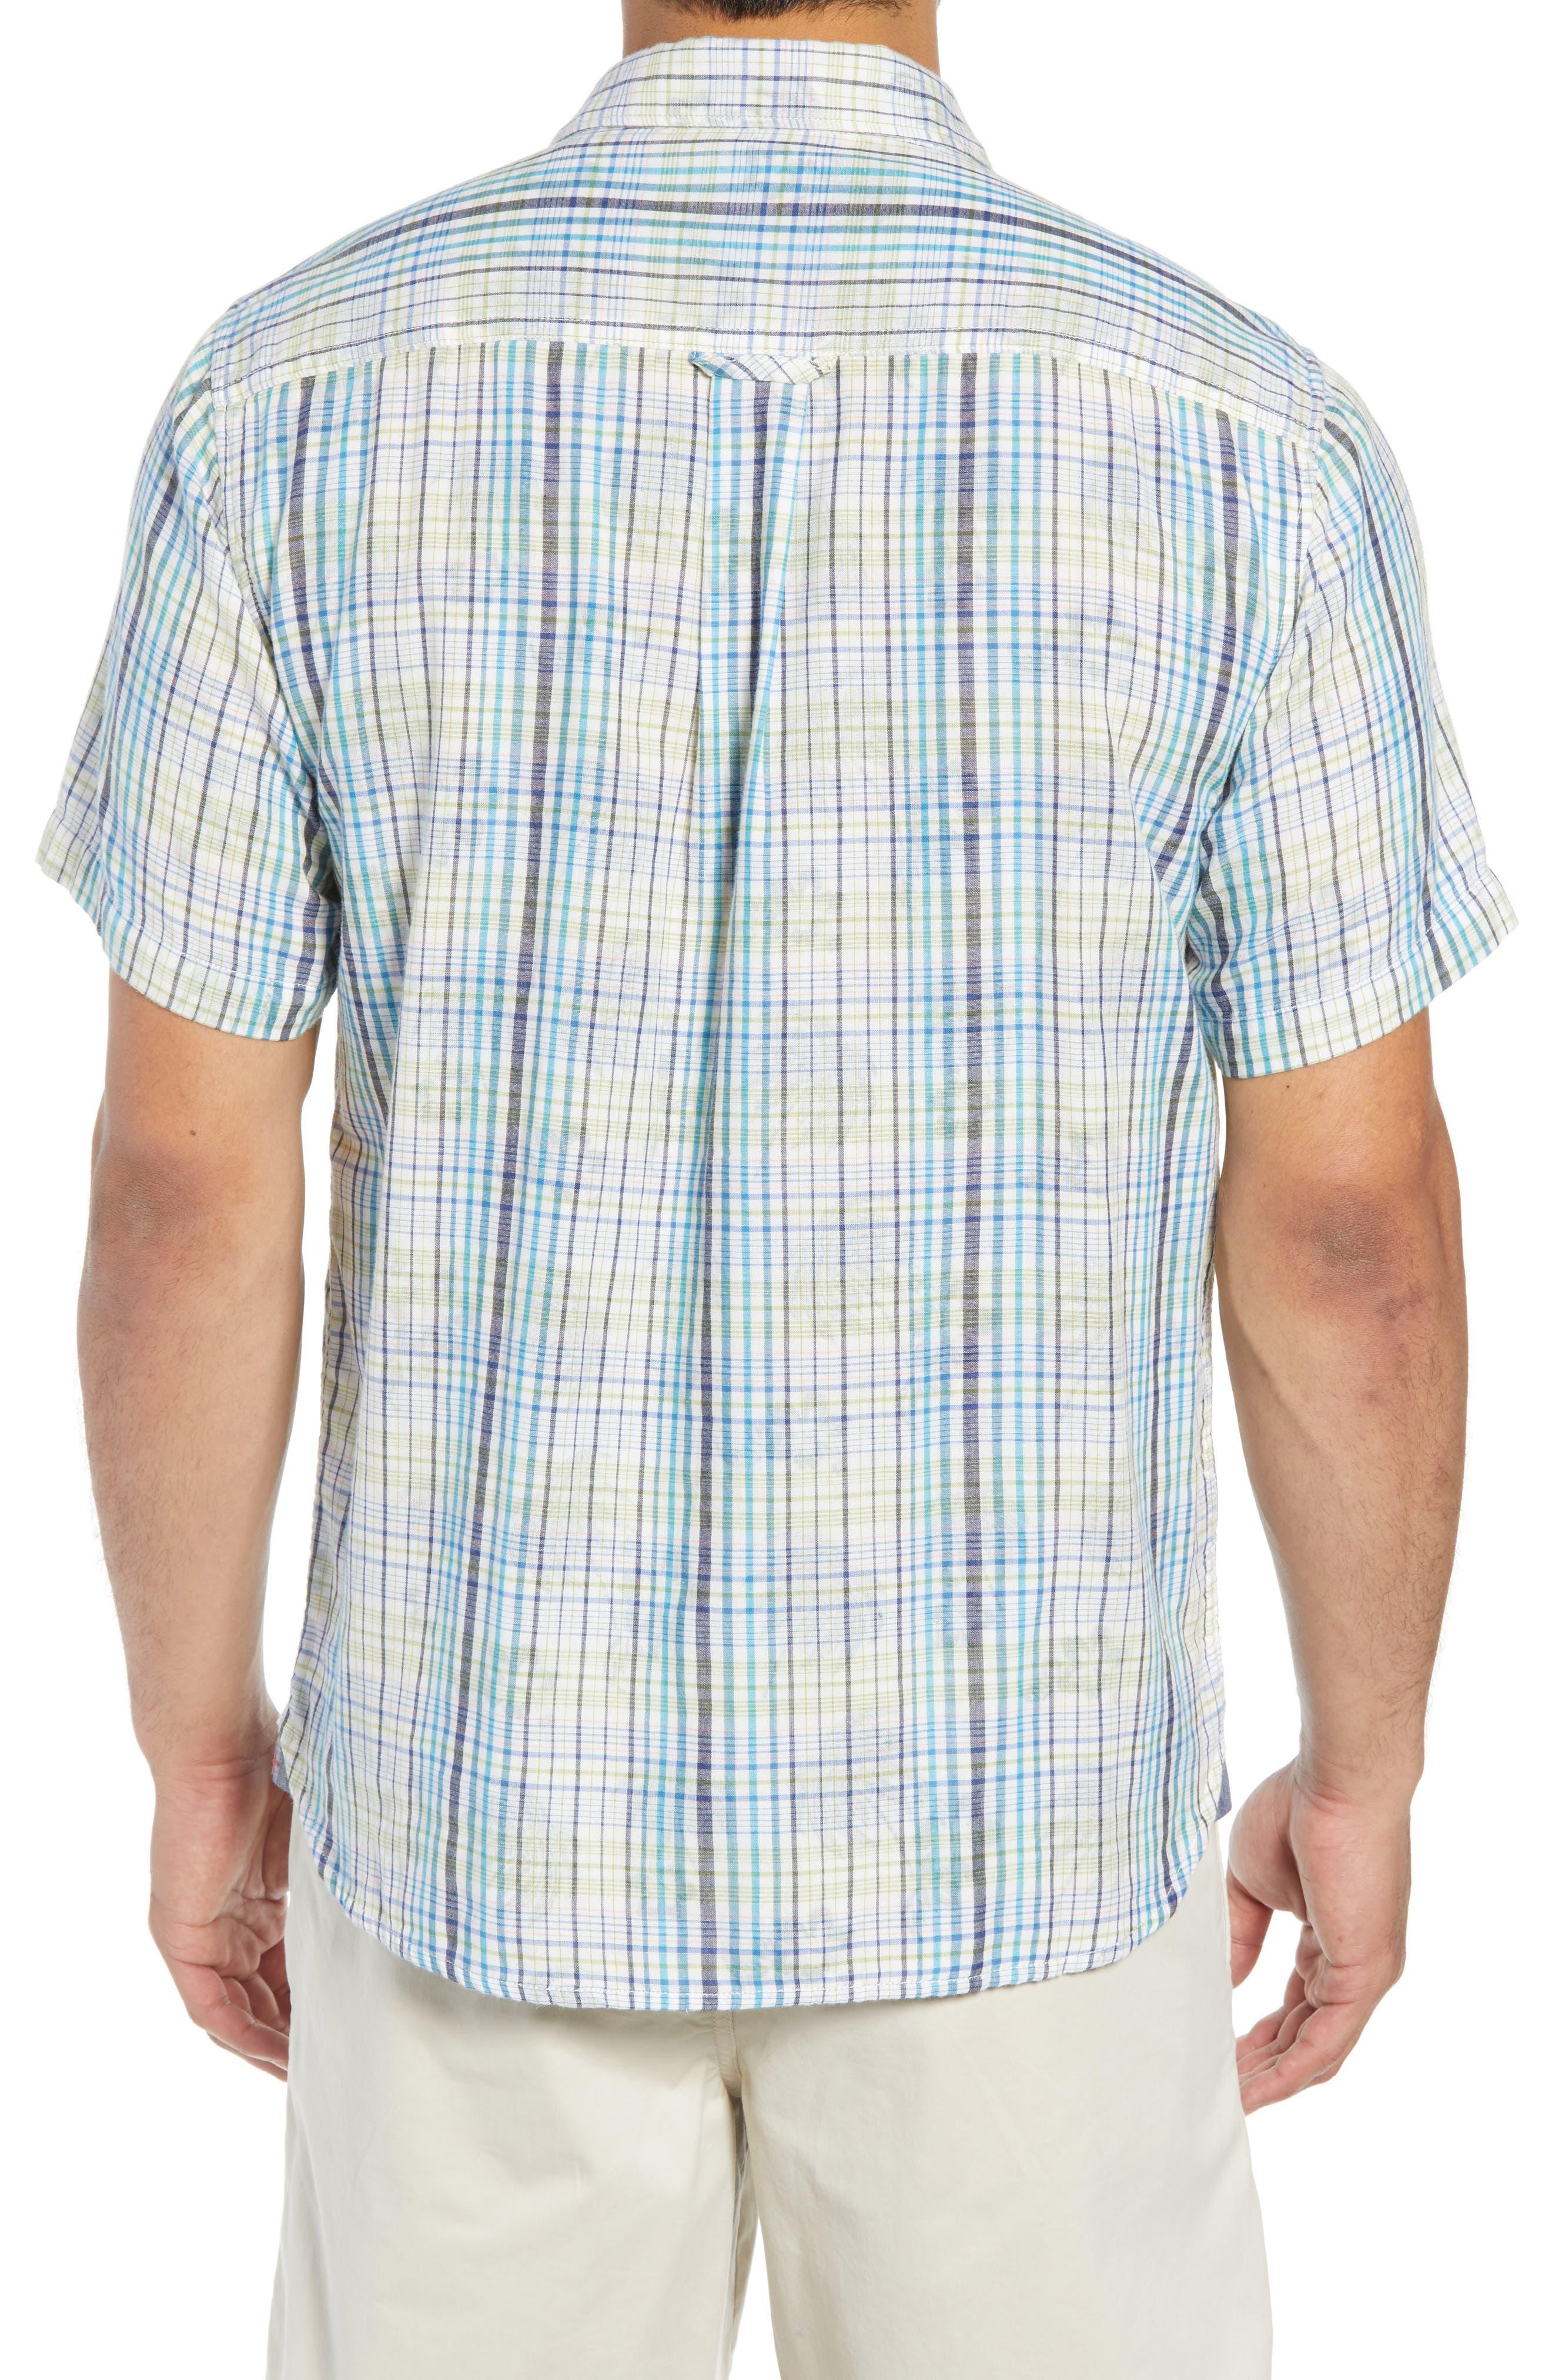 Hideaway Palms Camp Shirt,                             Alternate thumbnail 2, color,                             400